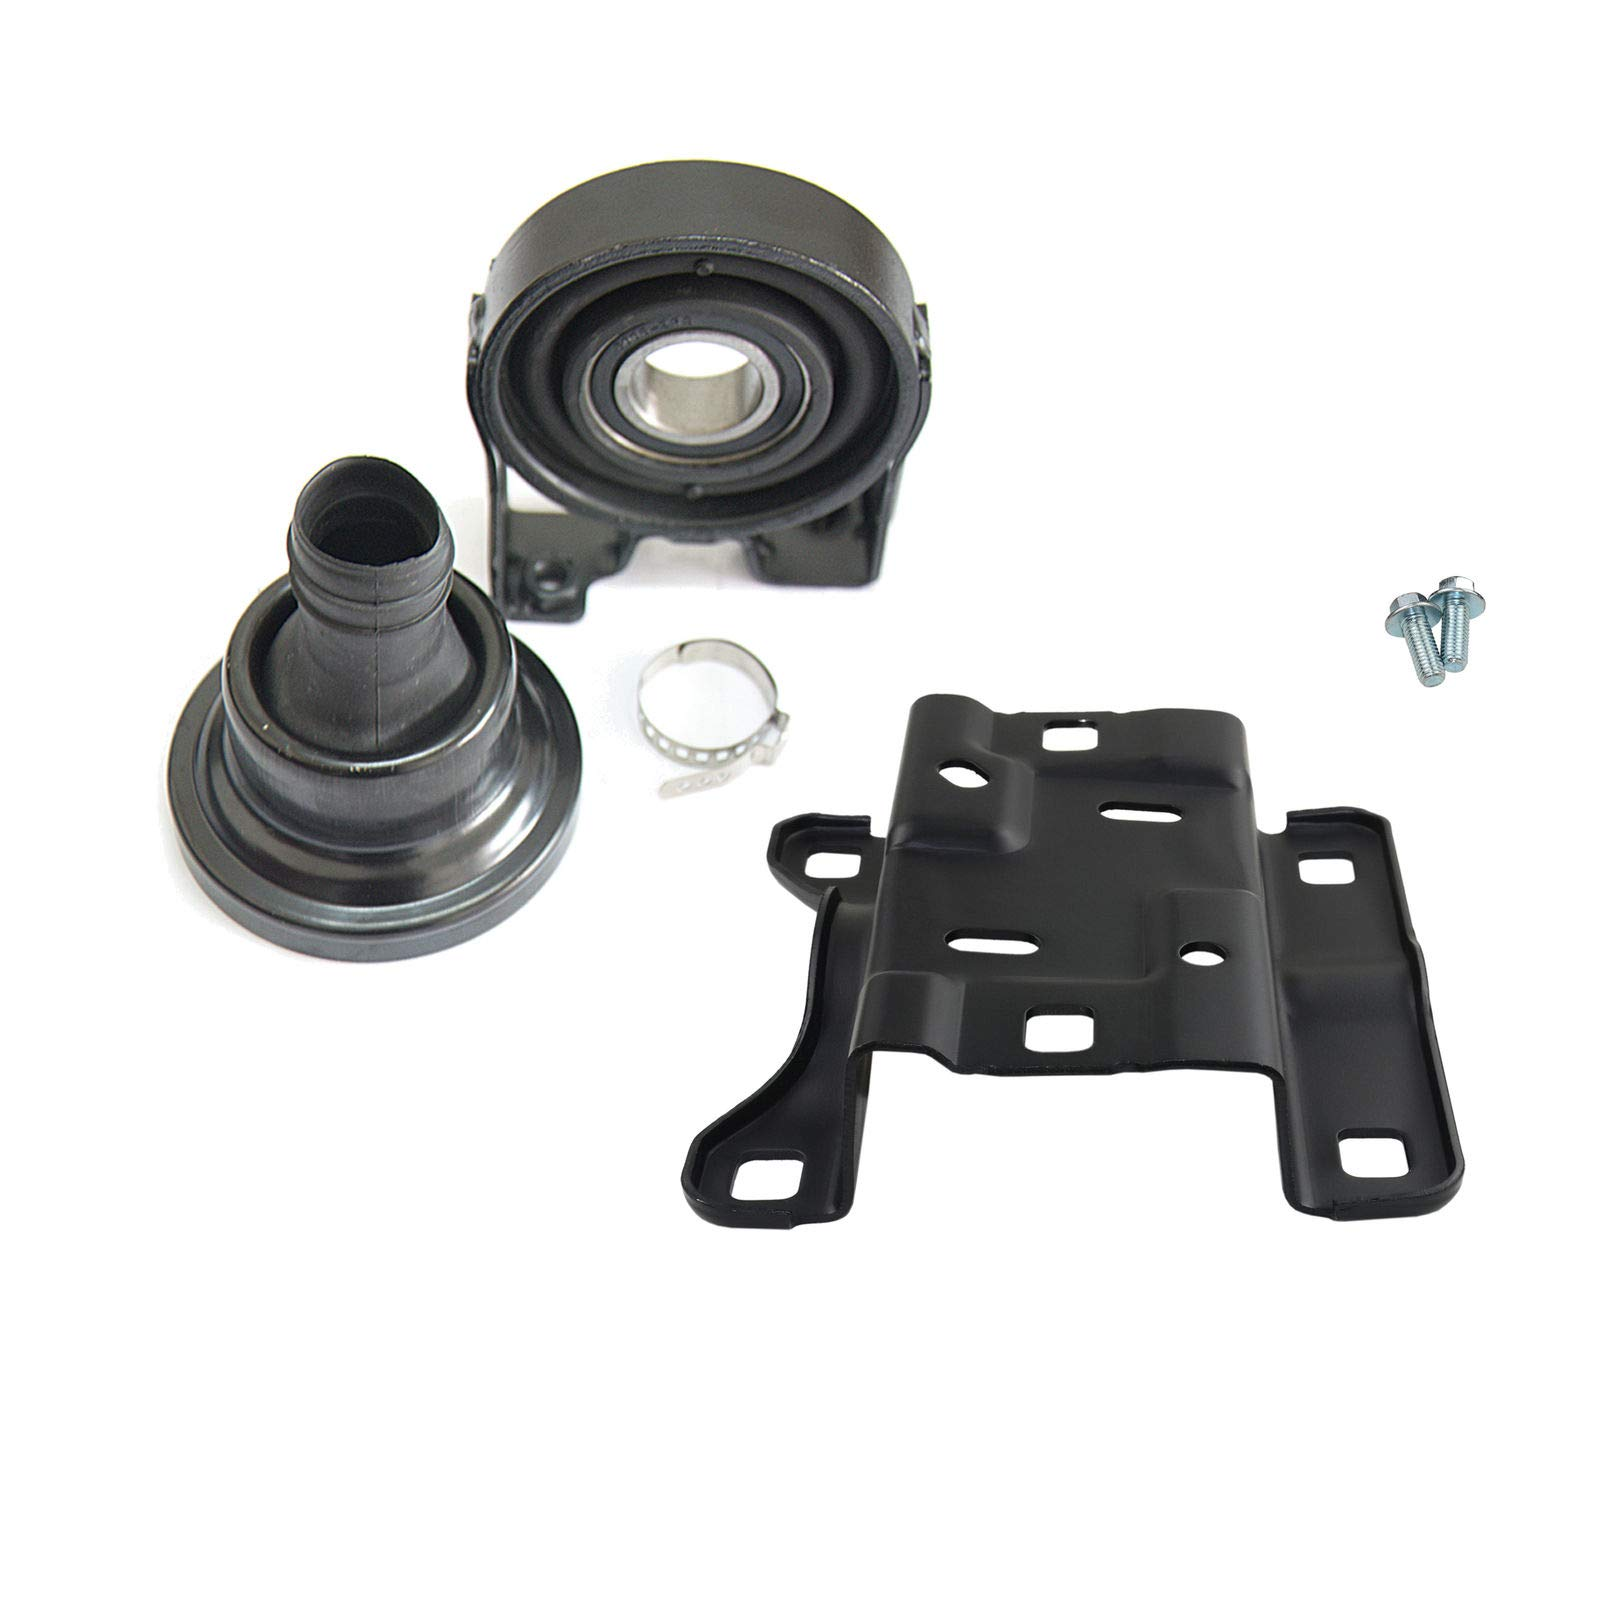 Driveshaft Center Bearing + Mounting Mount Kit 95542102021 For VW Touareg Cayenne 955